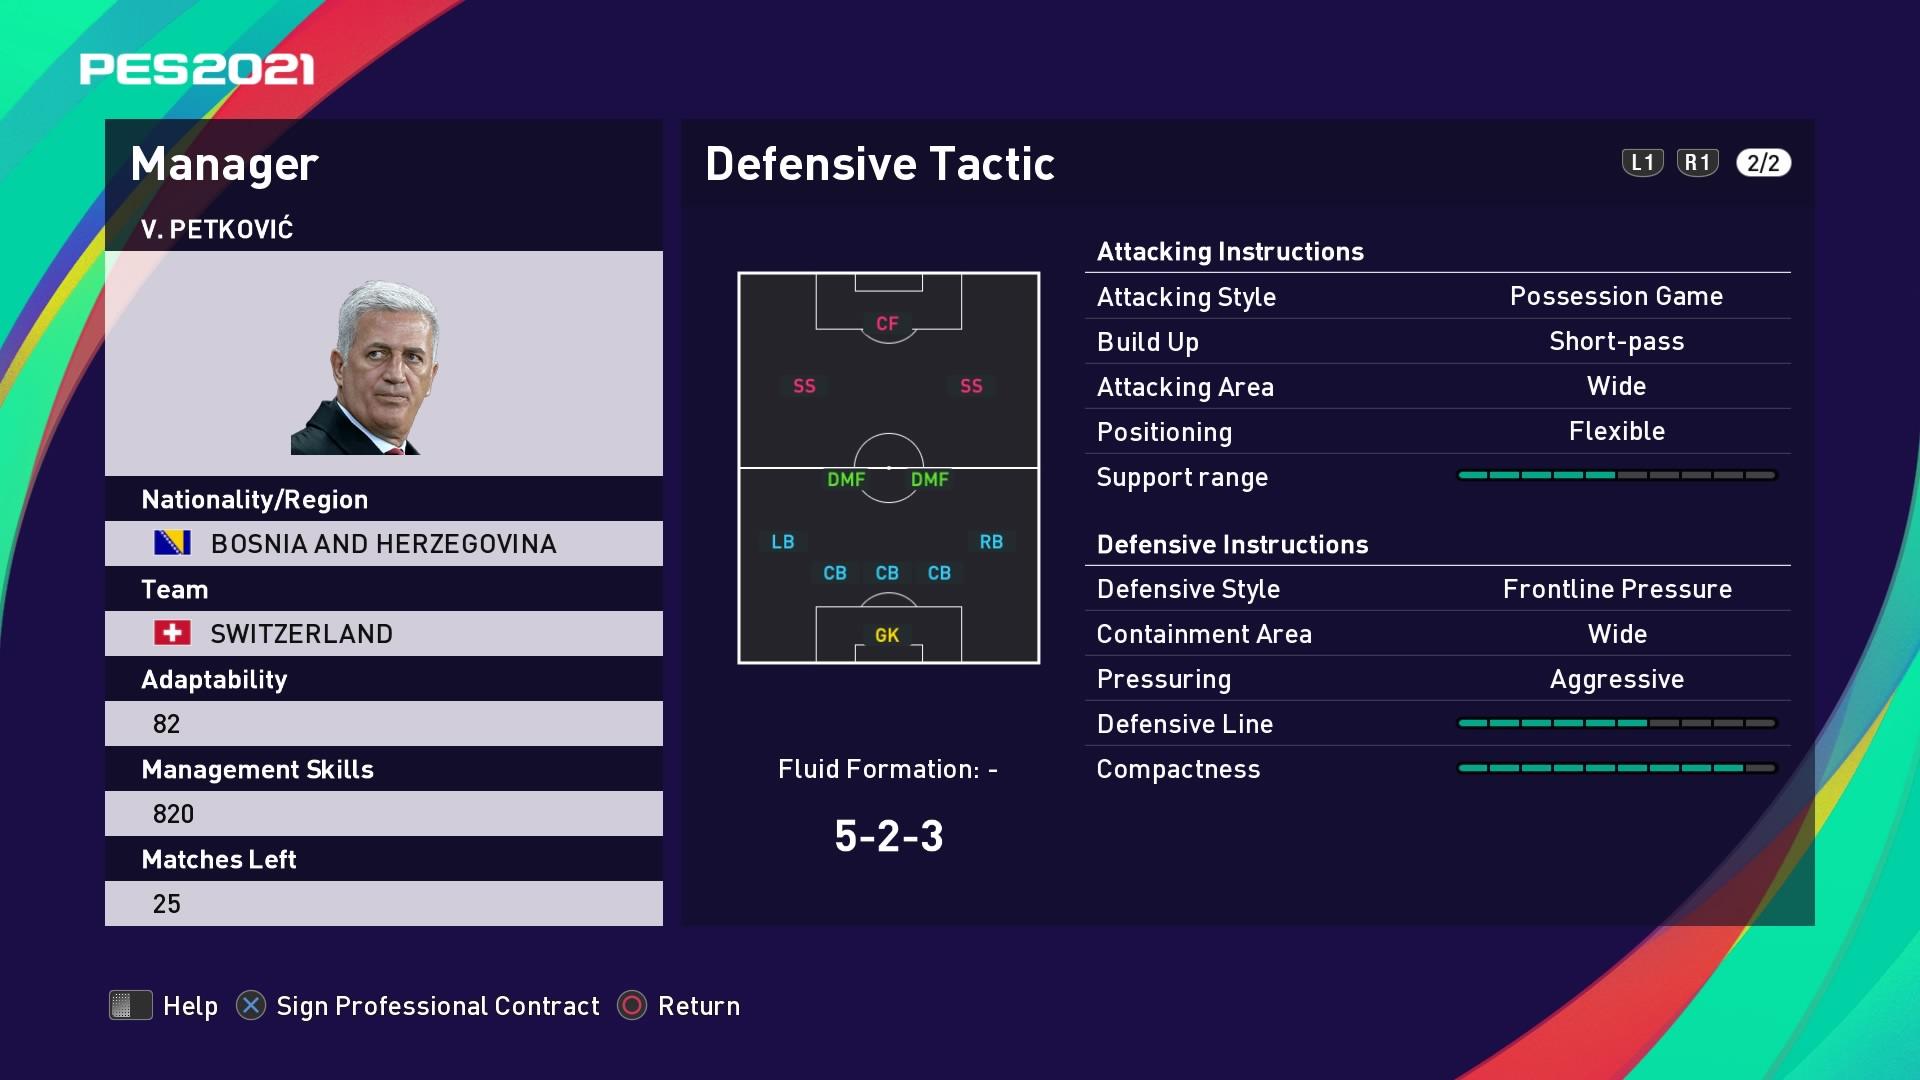 V. Petković (Vladimir Petković) Defensive Tactic in PES 2021 myClub